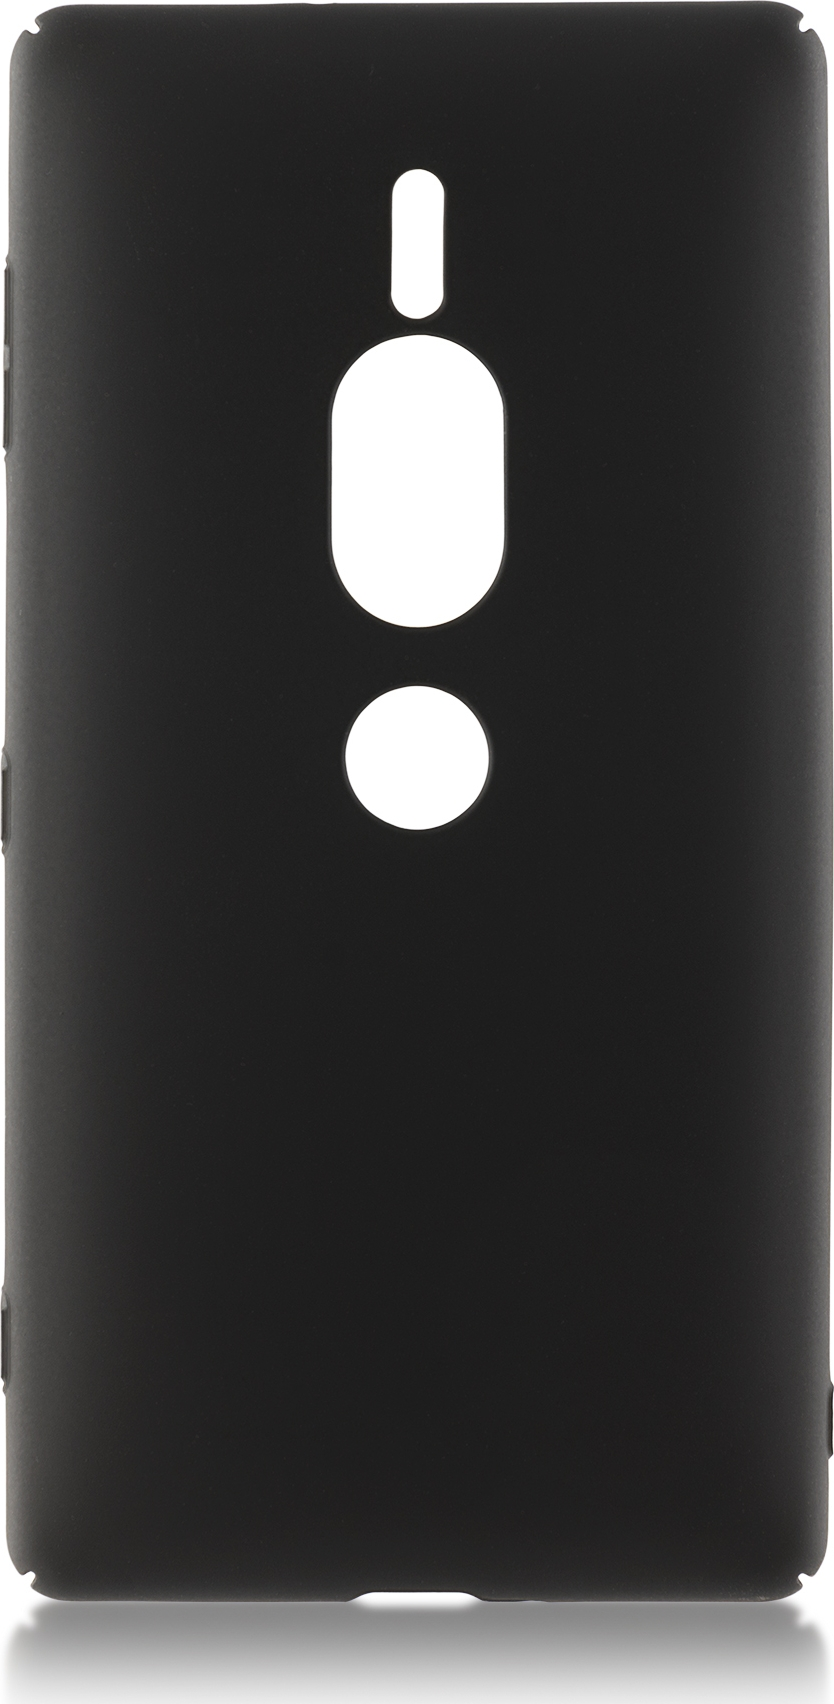 Чехол Brosco 4Side Soft-Touch для Sony Xperia XZ2 Premium, черный чехол brosco colourful для sony xperia xz2 розовый